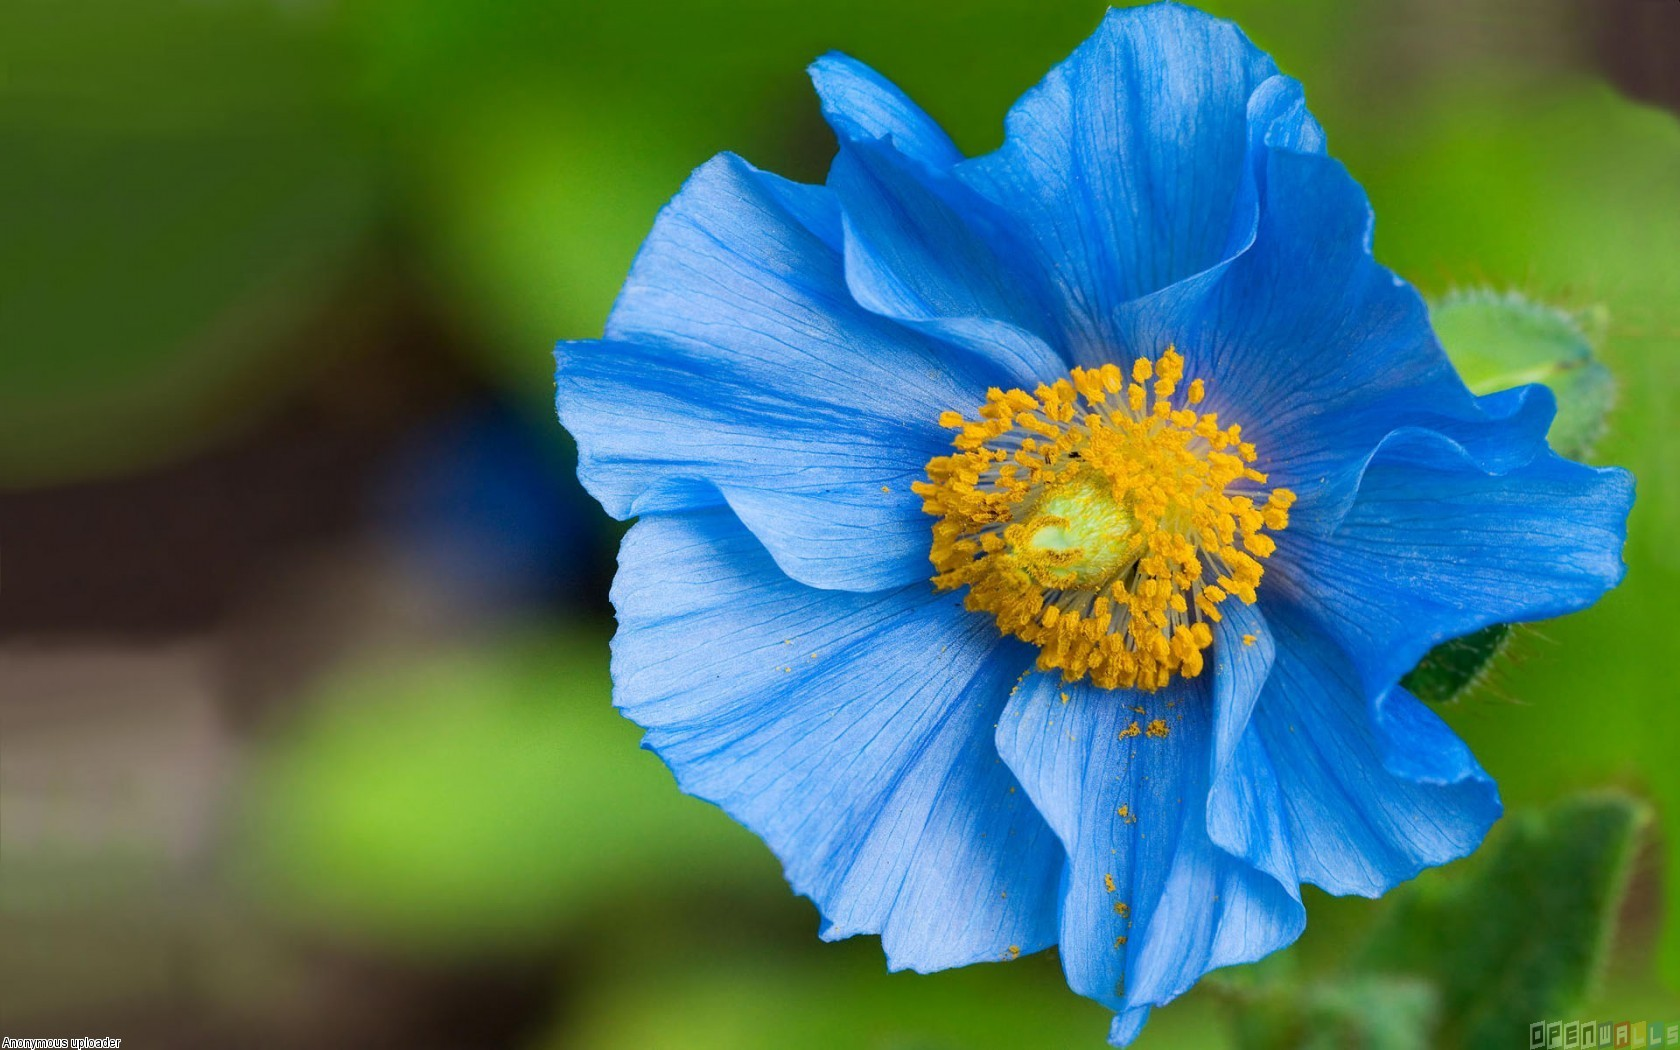 Blue flowers names 31 free hd wallpaper hdflowerwallpaper blue flowers names 31 free hd wallpaper izmirmasajfo